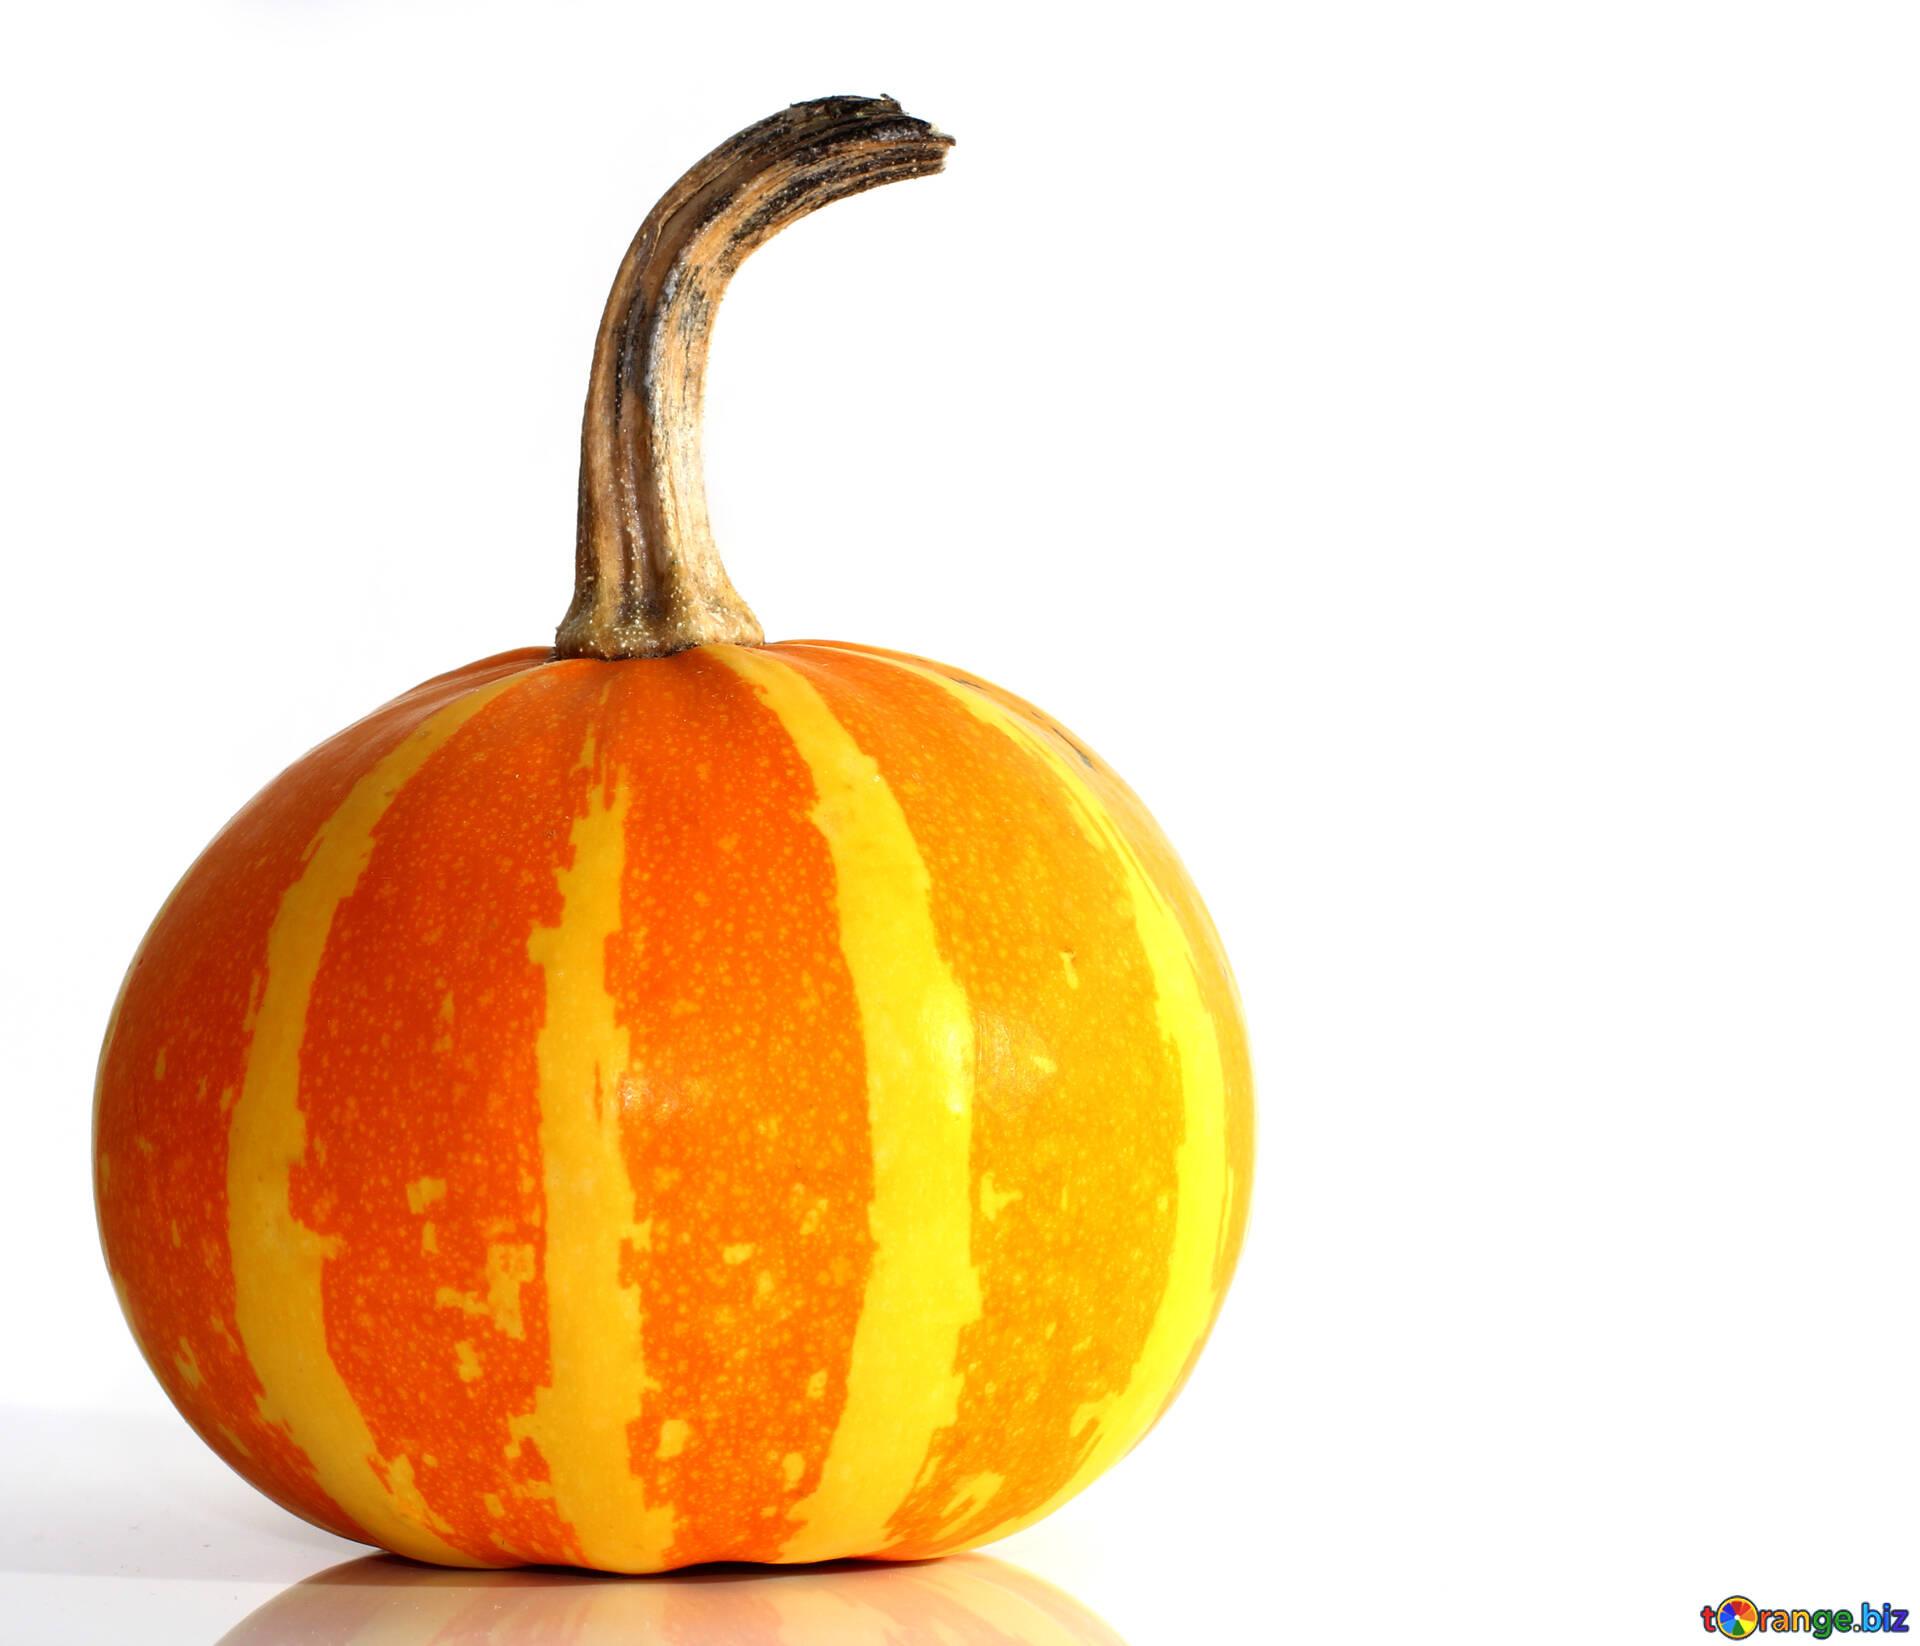 Pumpkin Isolated On White Background Beautiful Pumpkin On